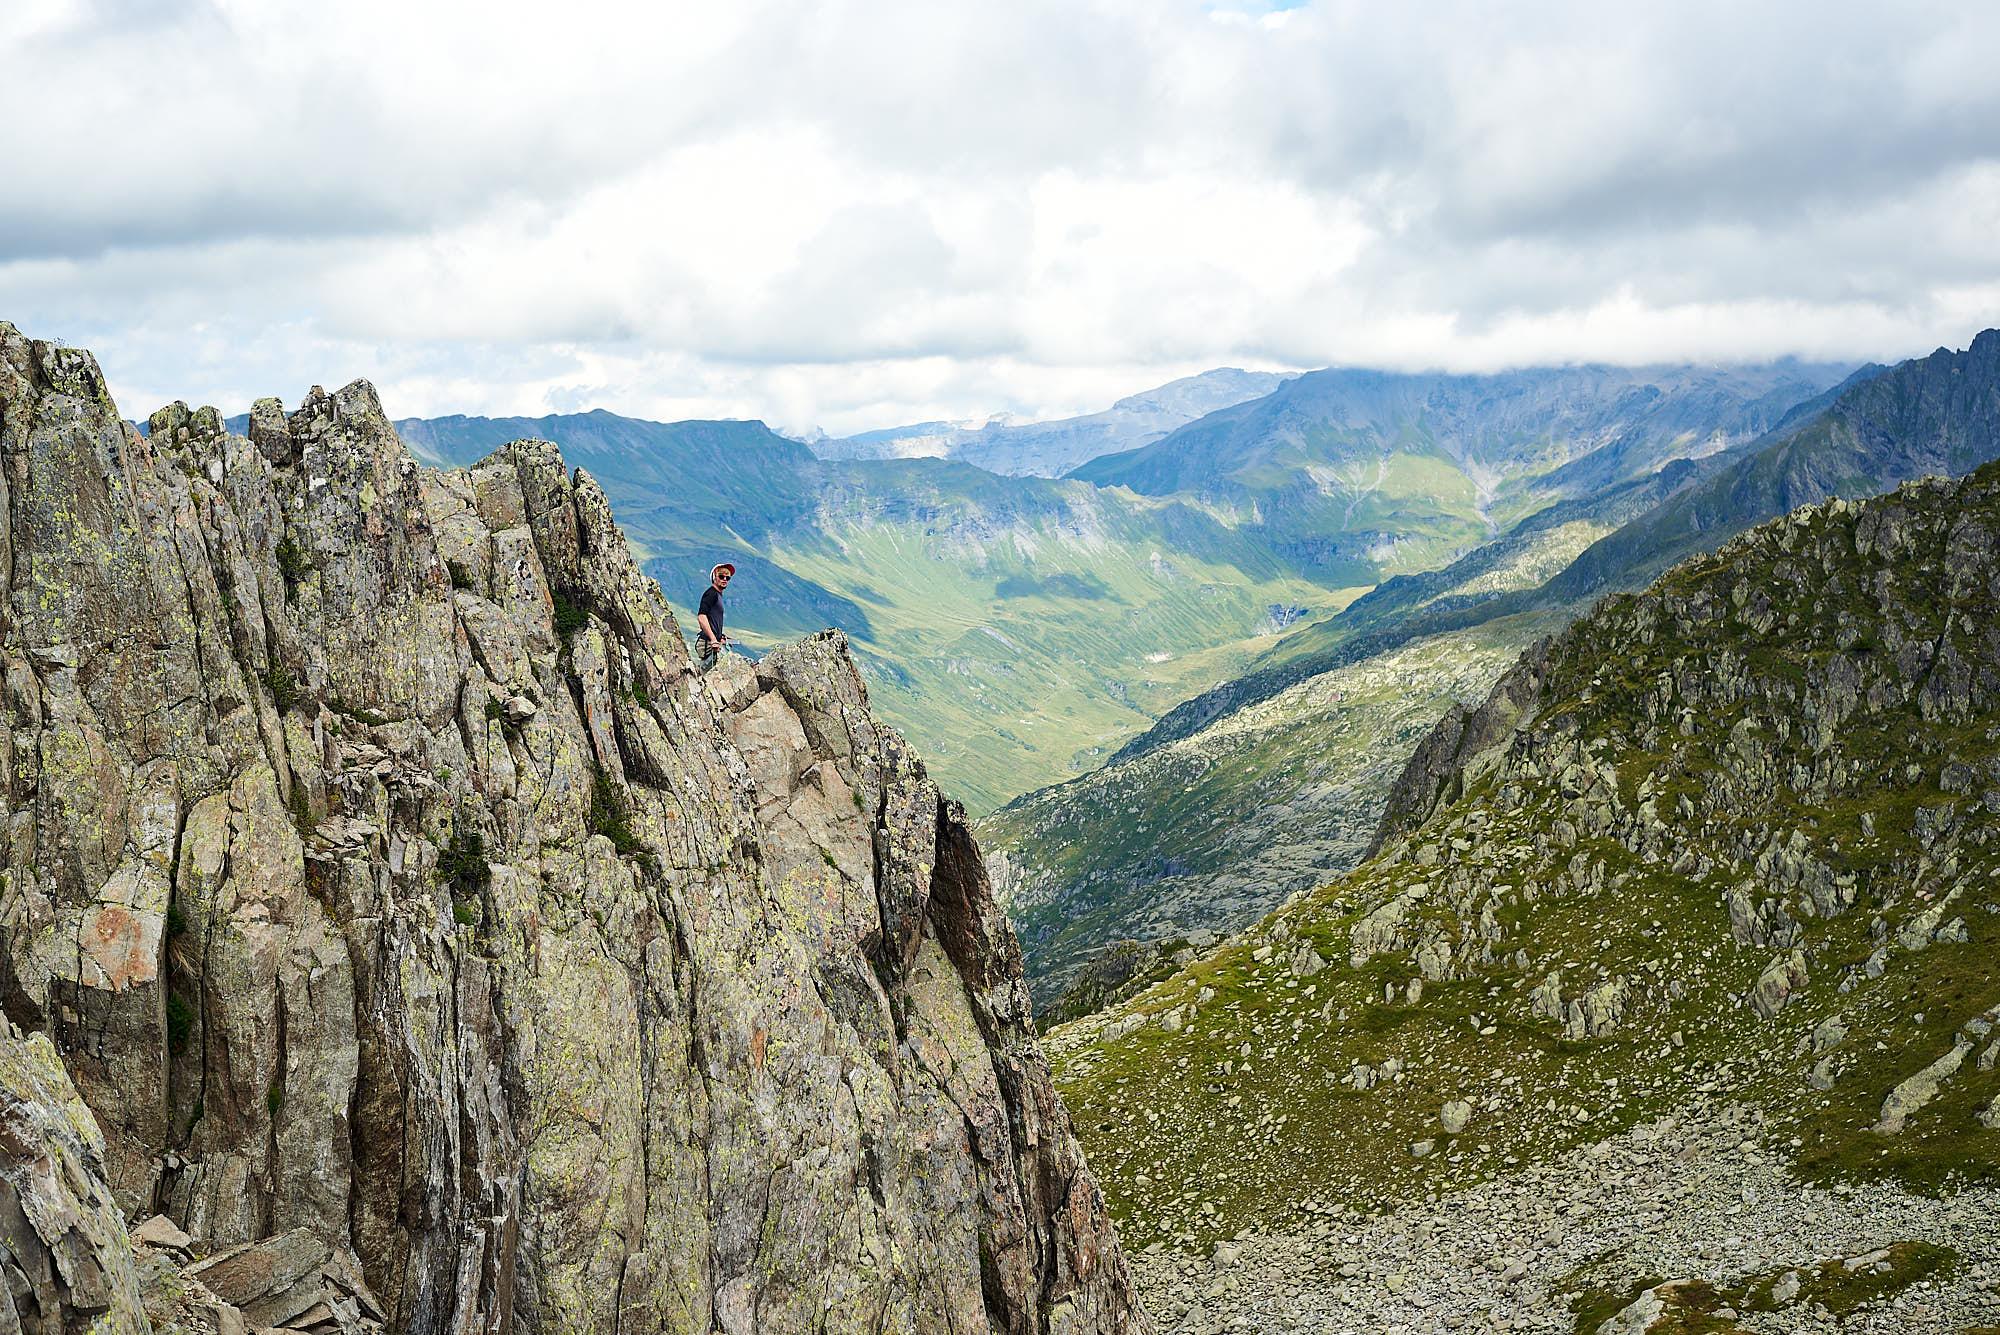 Climber in a mountainous landscape near Chamonix in France